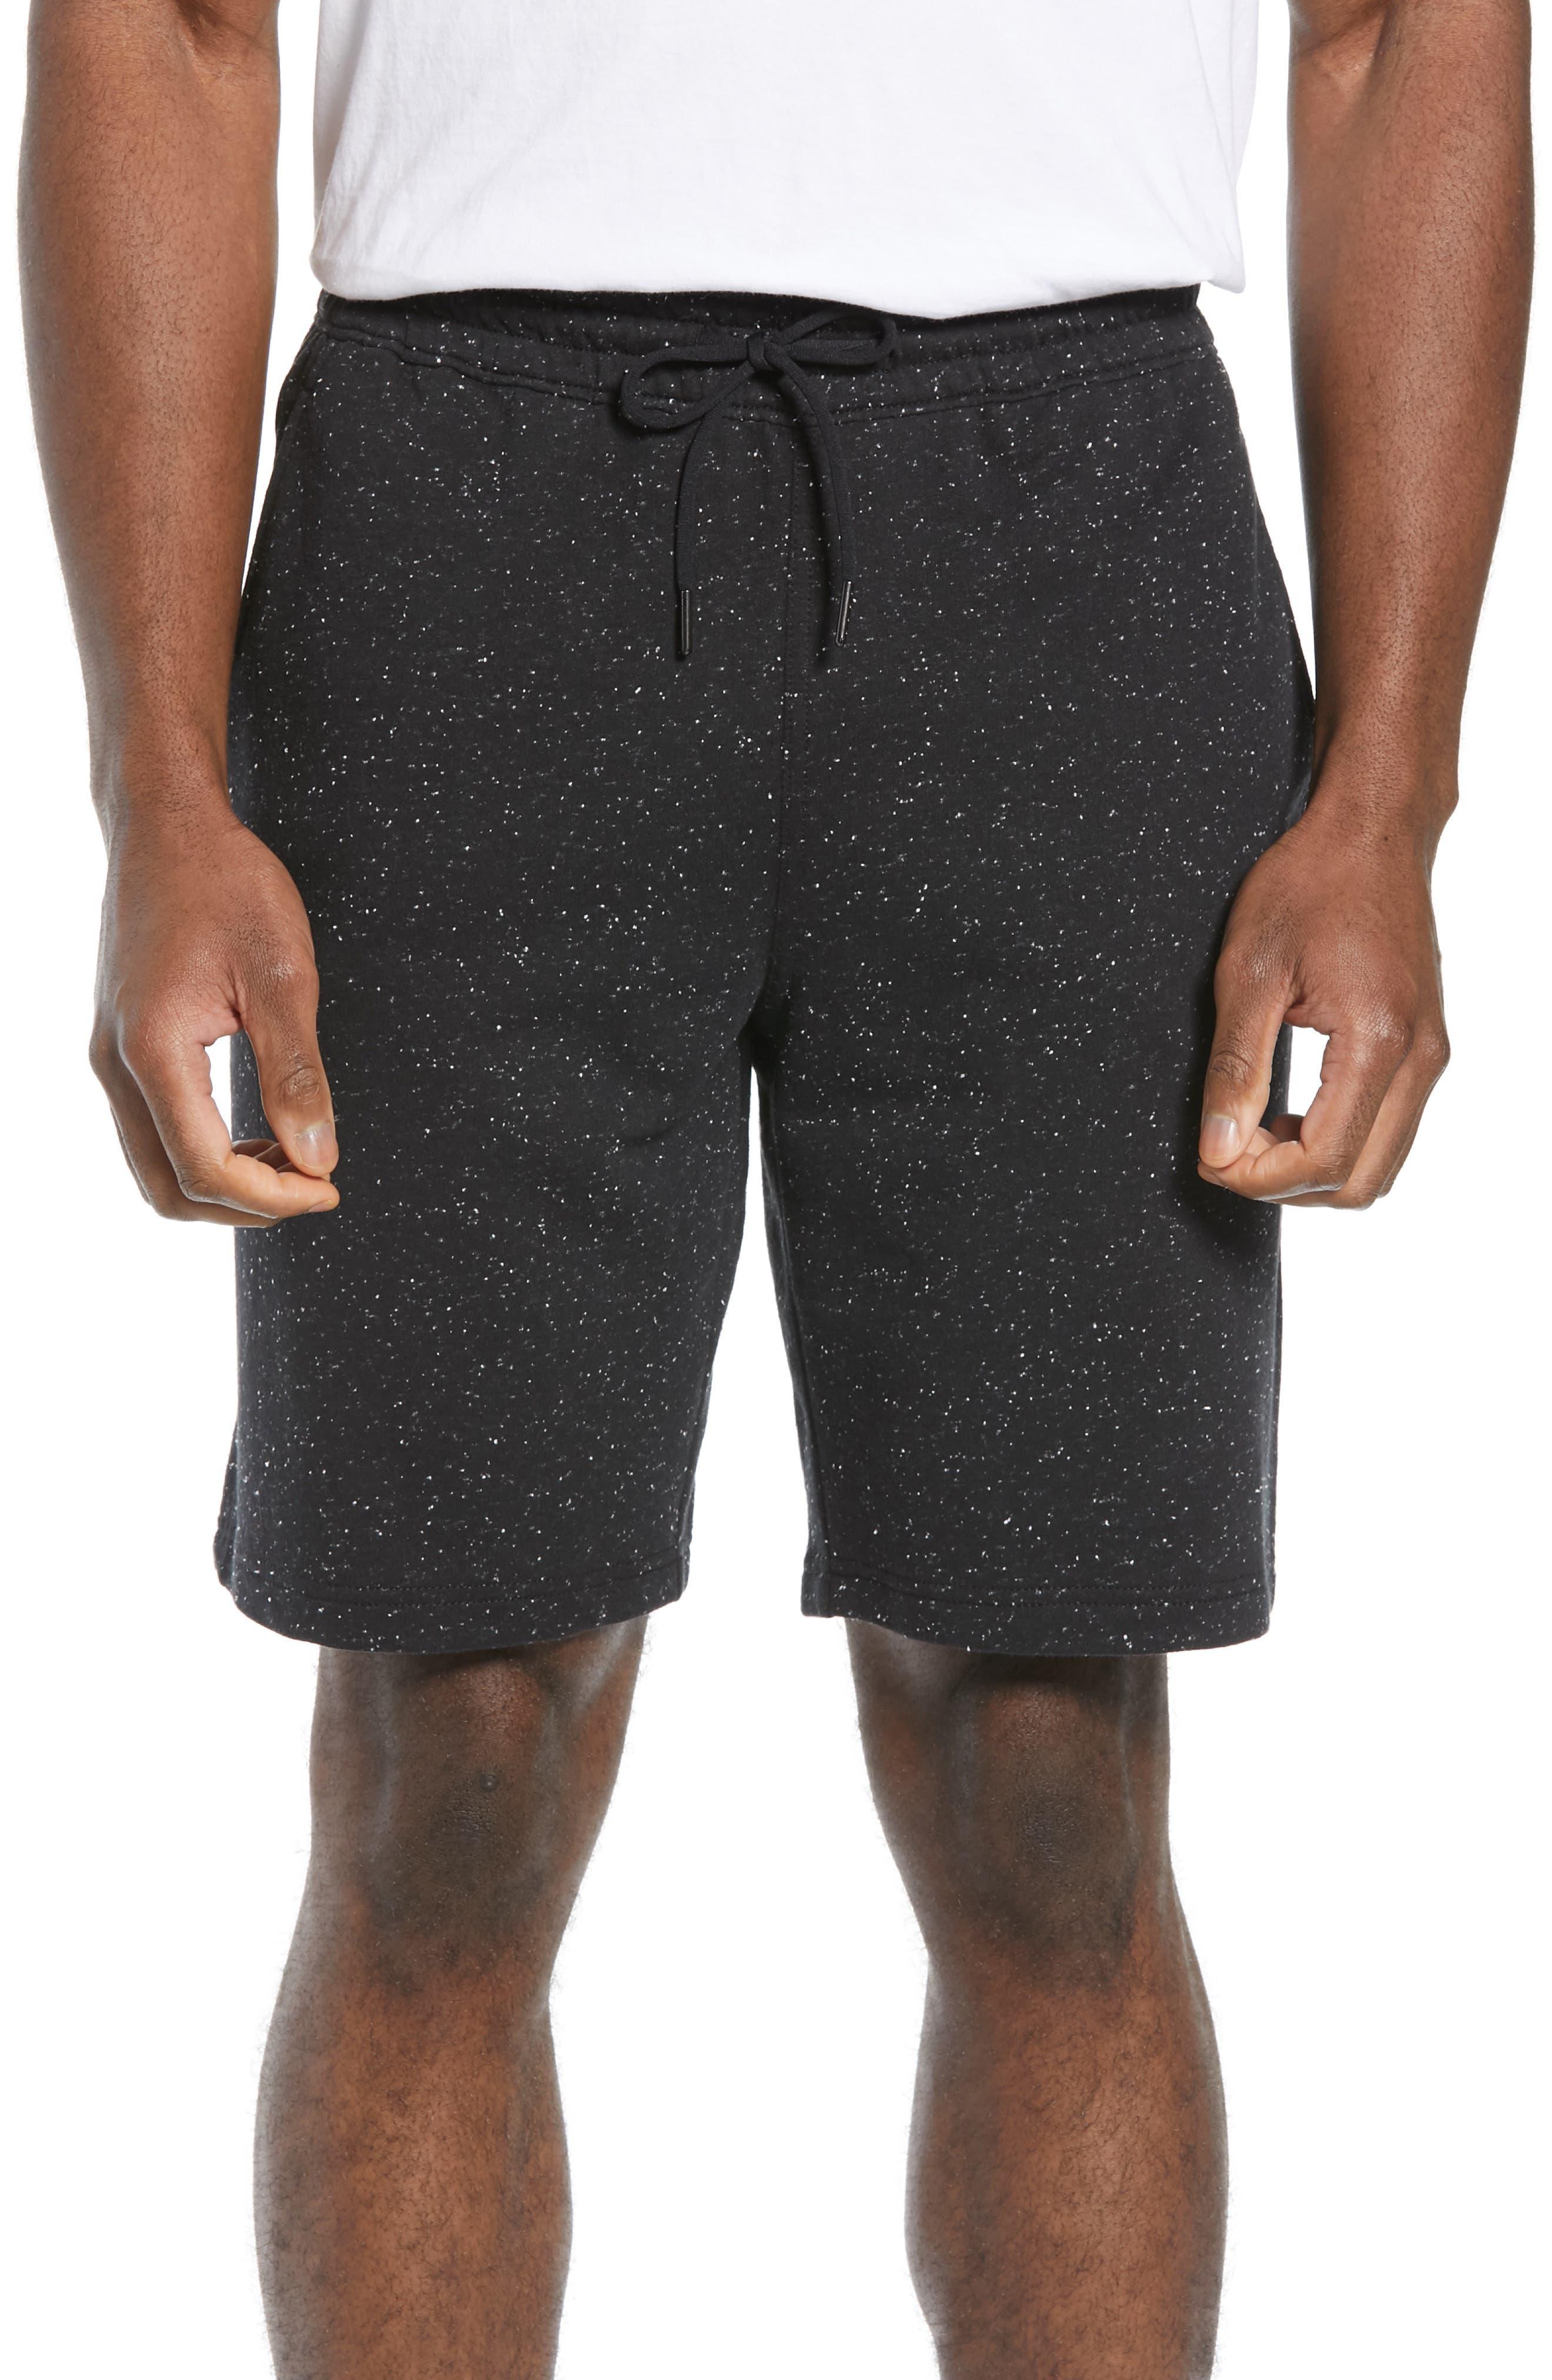 ZELLA, Neppy Fleece Athletic Shorts, Main thumbnail 1, color, 001